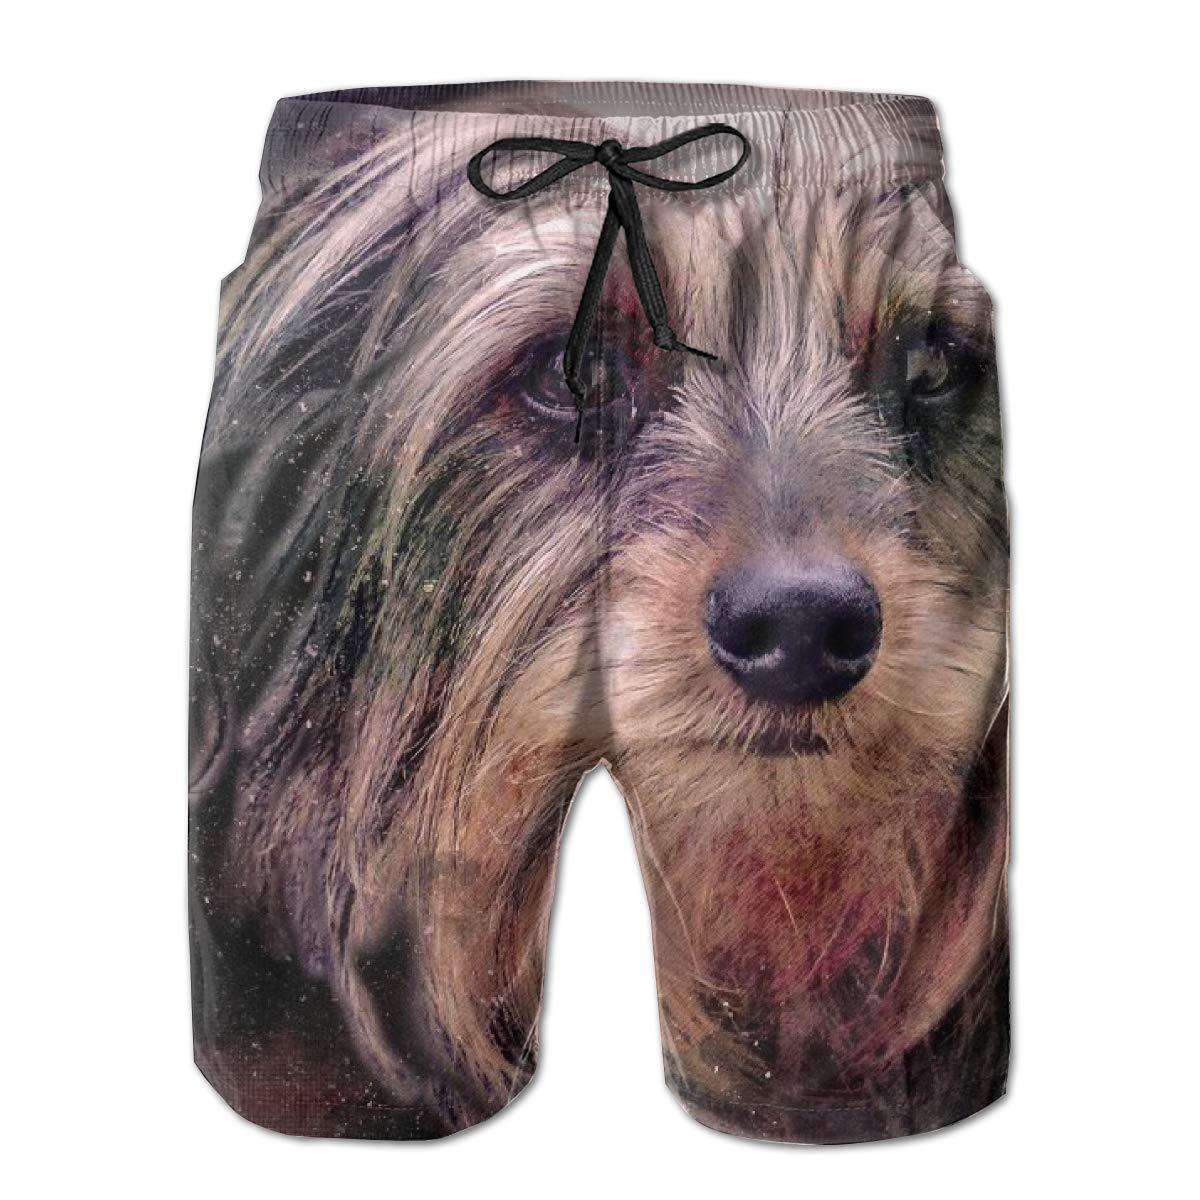 SARA NELL Mens Swim Trunks Schnauzer Dog Animal Surfing Beach Board Shorts Swimwear